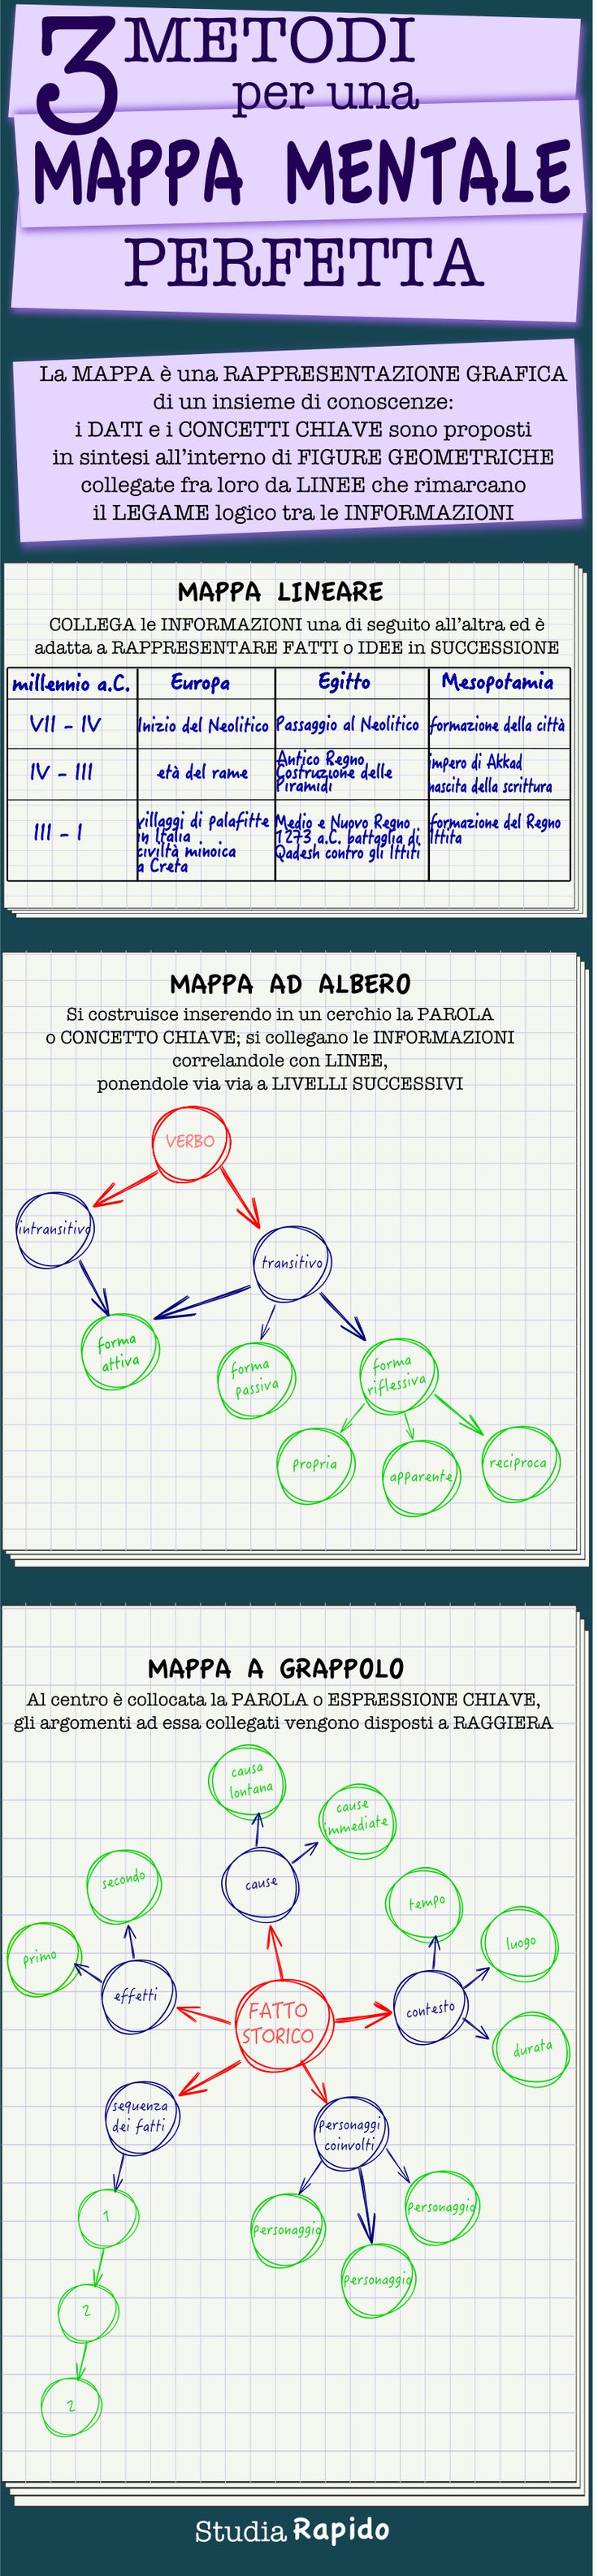 3 metodi per una mappa mentale perfetta